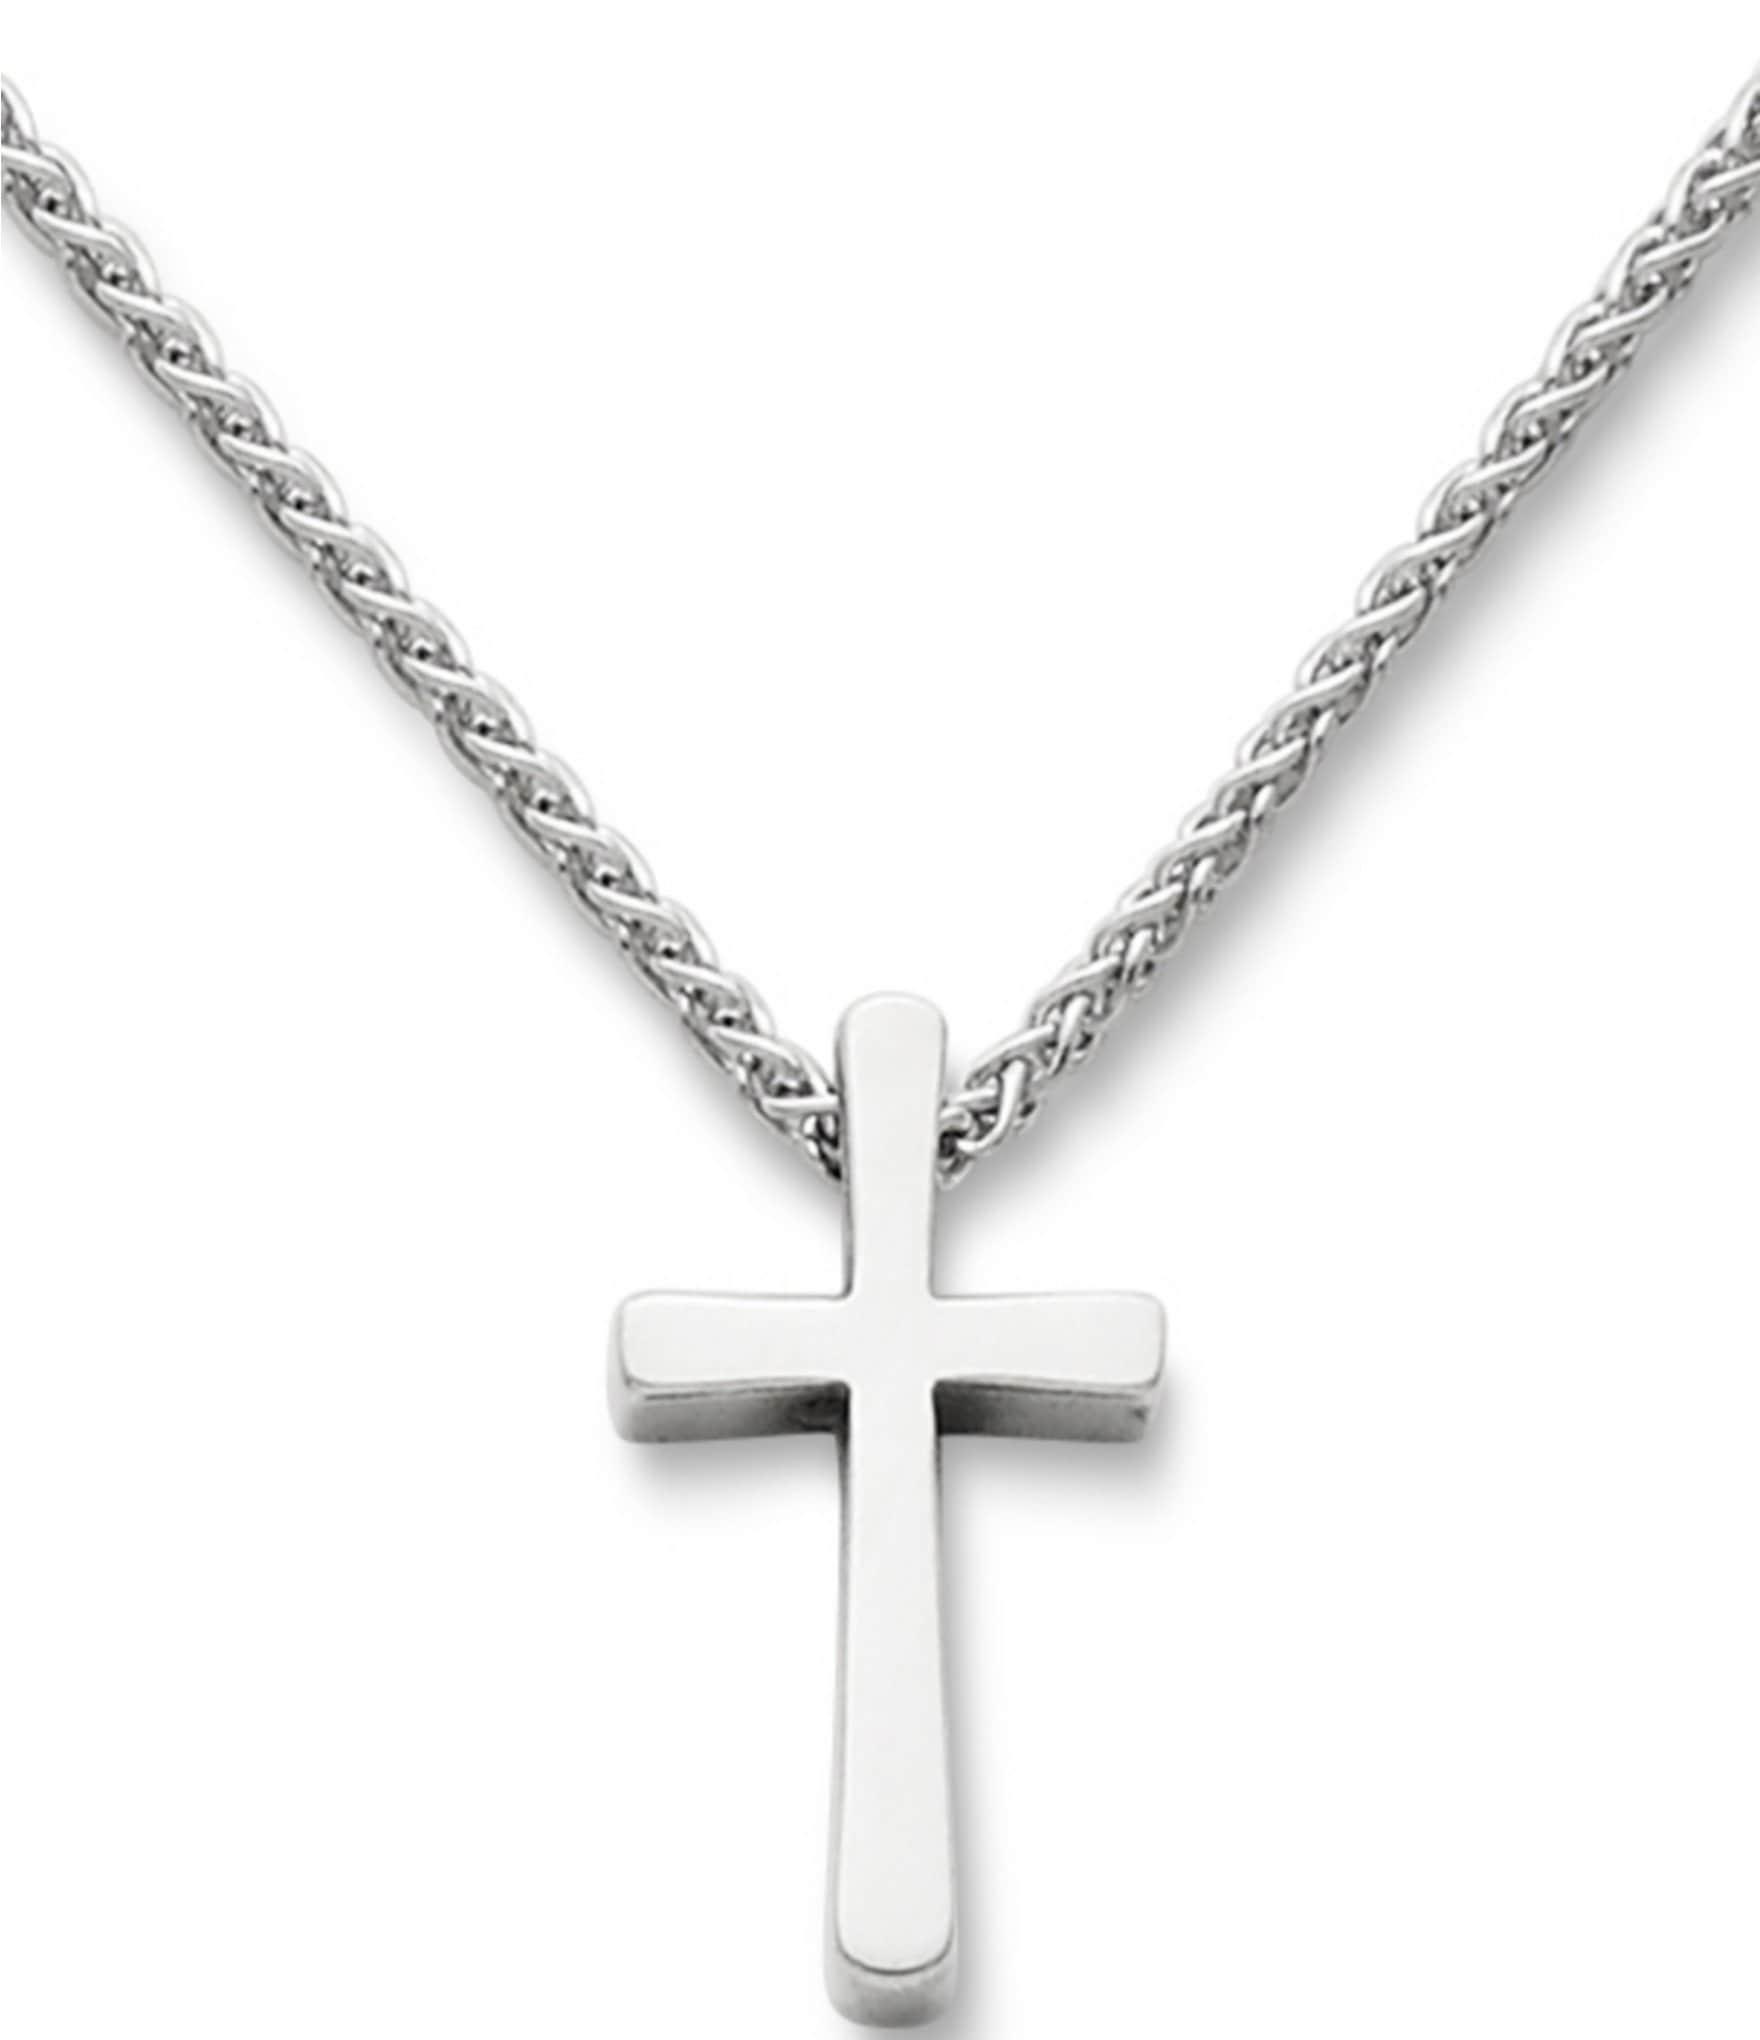 James Avery Plain Latin Cross Pendant Necklace